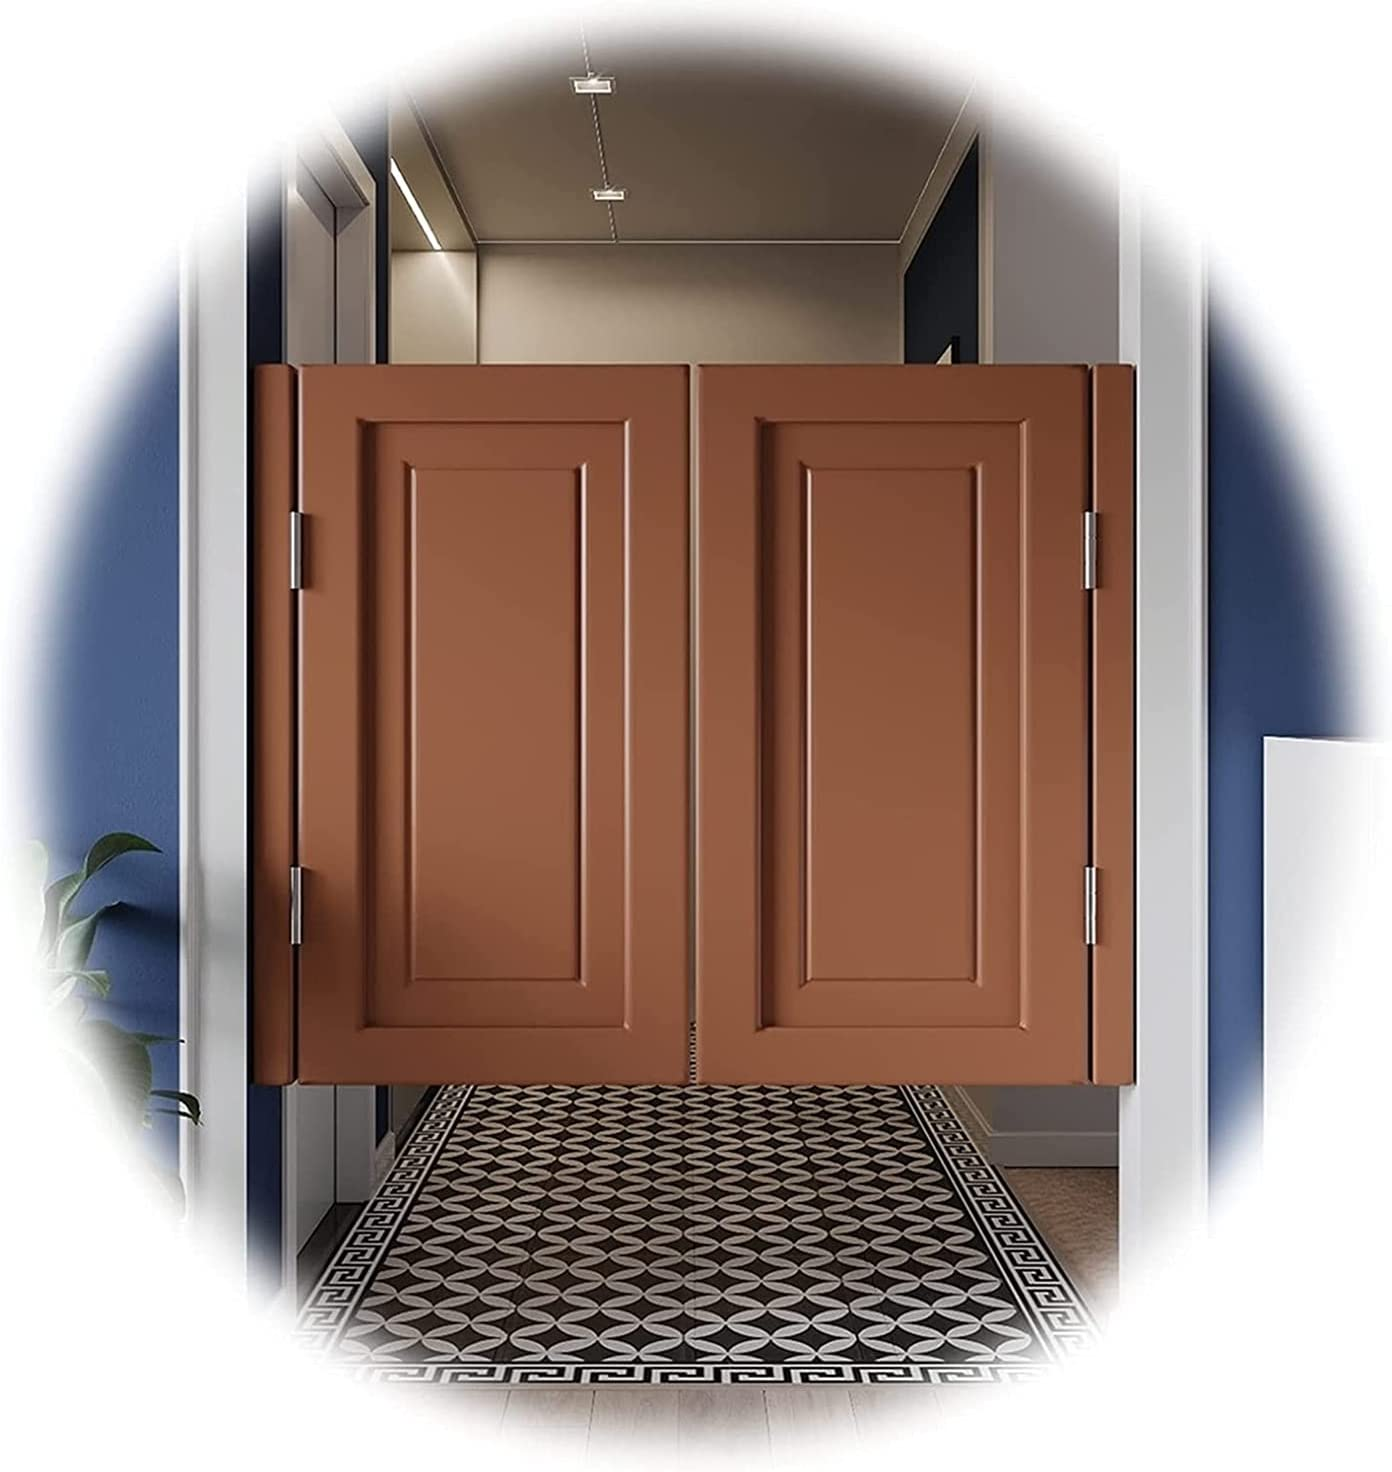 Puertas de café de balanceo, puerta de la cocina de la cocina de la cocina, la puerta de la cintura media de la madera maciza mediterránea, la división de la puerta de la decoración de la pata de jard